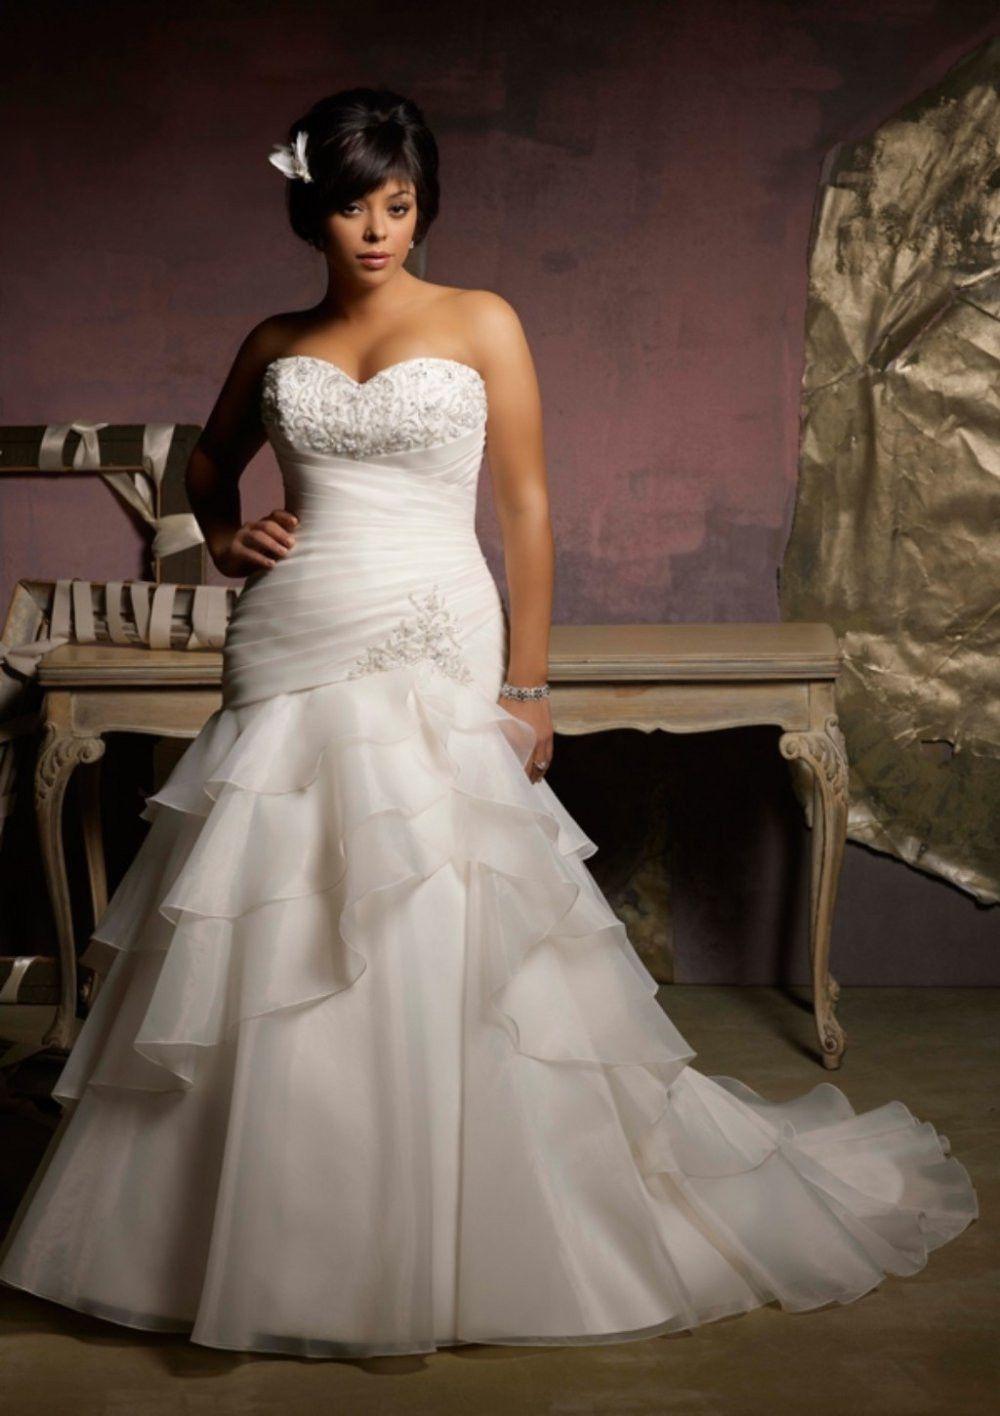 Strapless bra for wedding dress plus size  Ruffled Tiered organza plus size wedding dress at Bling Brides